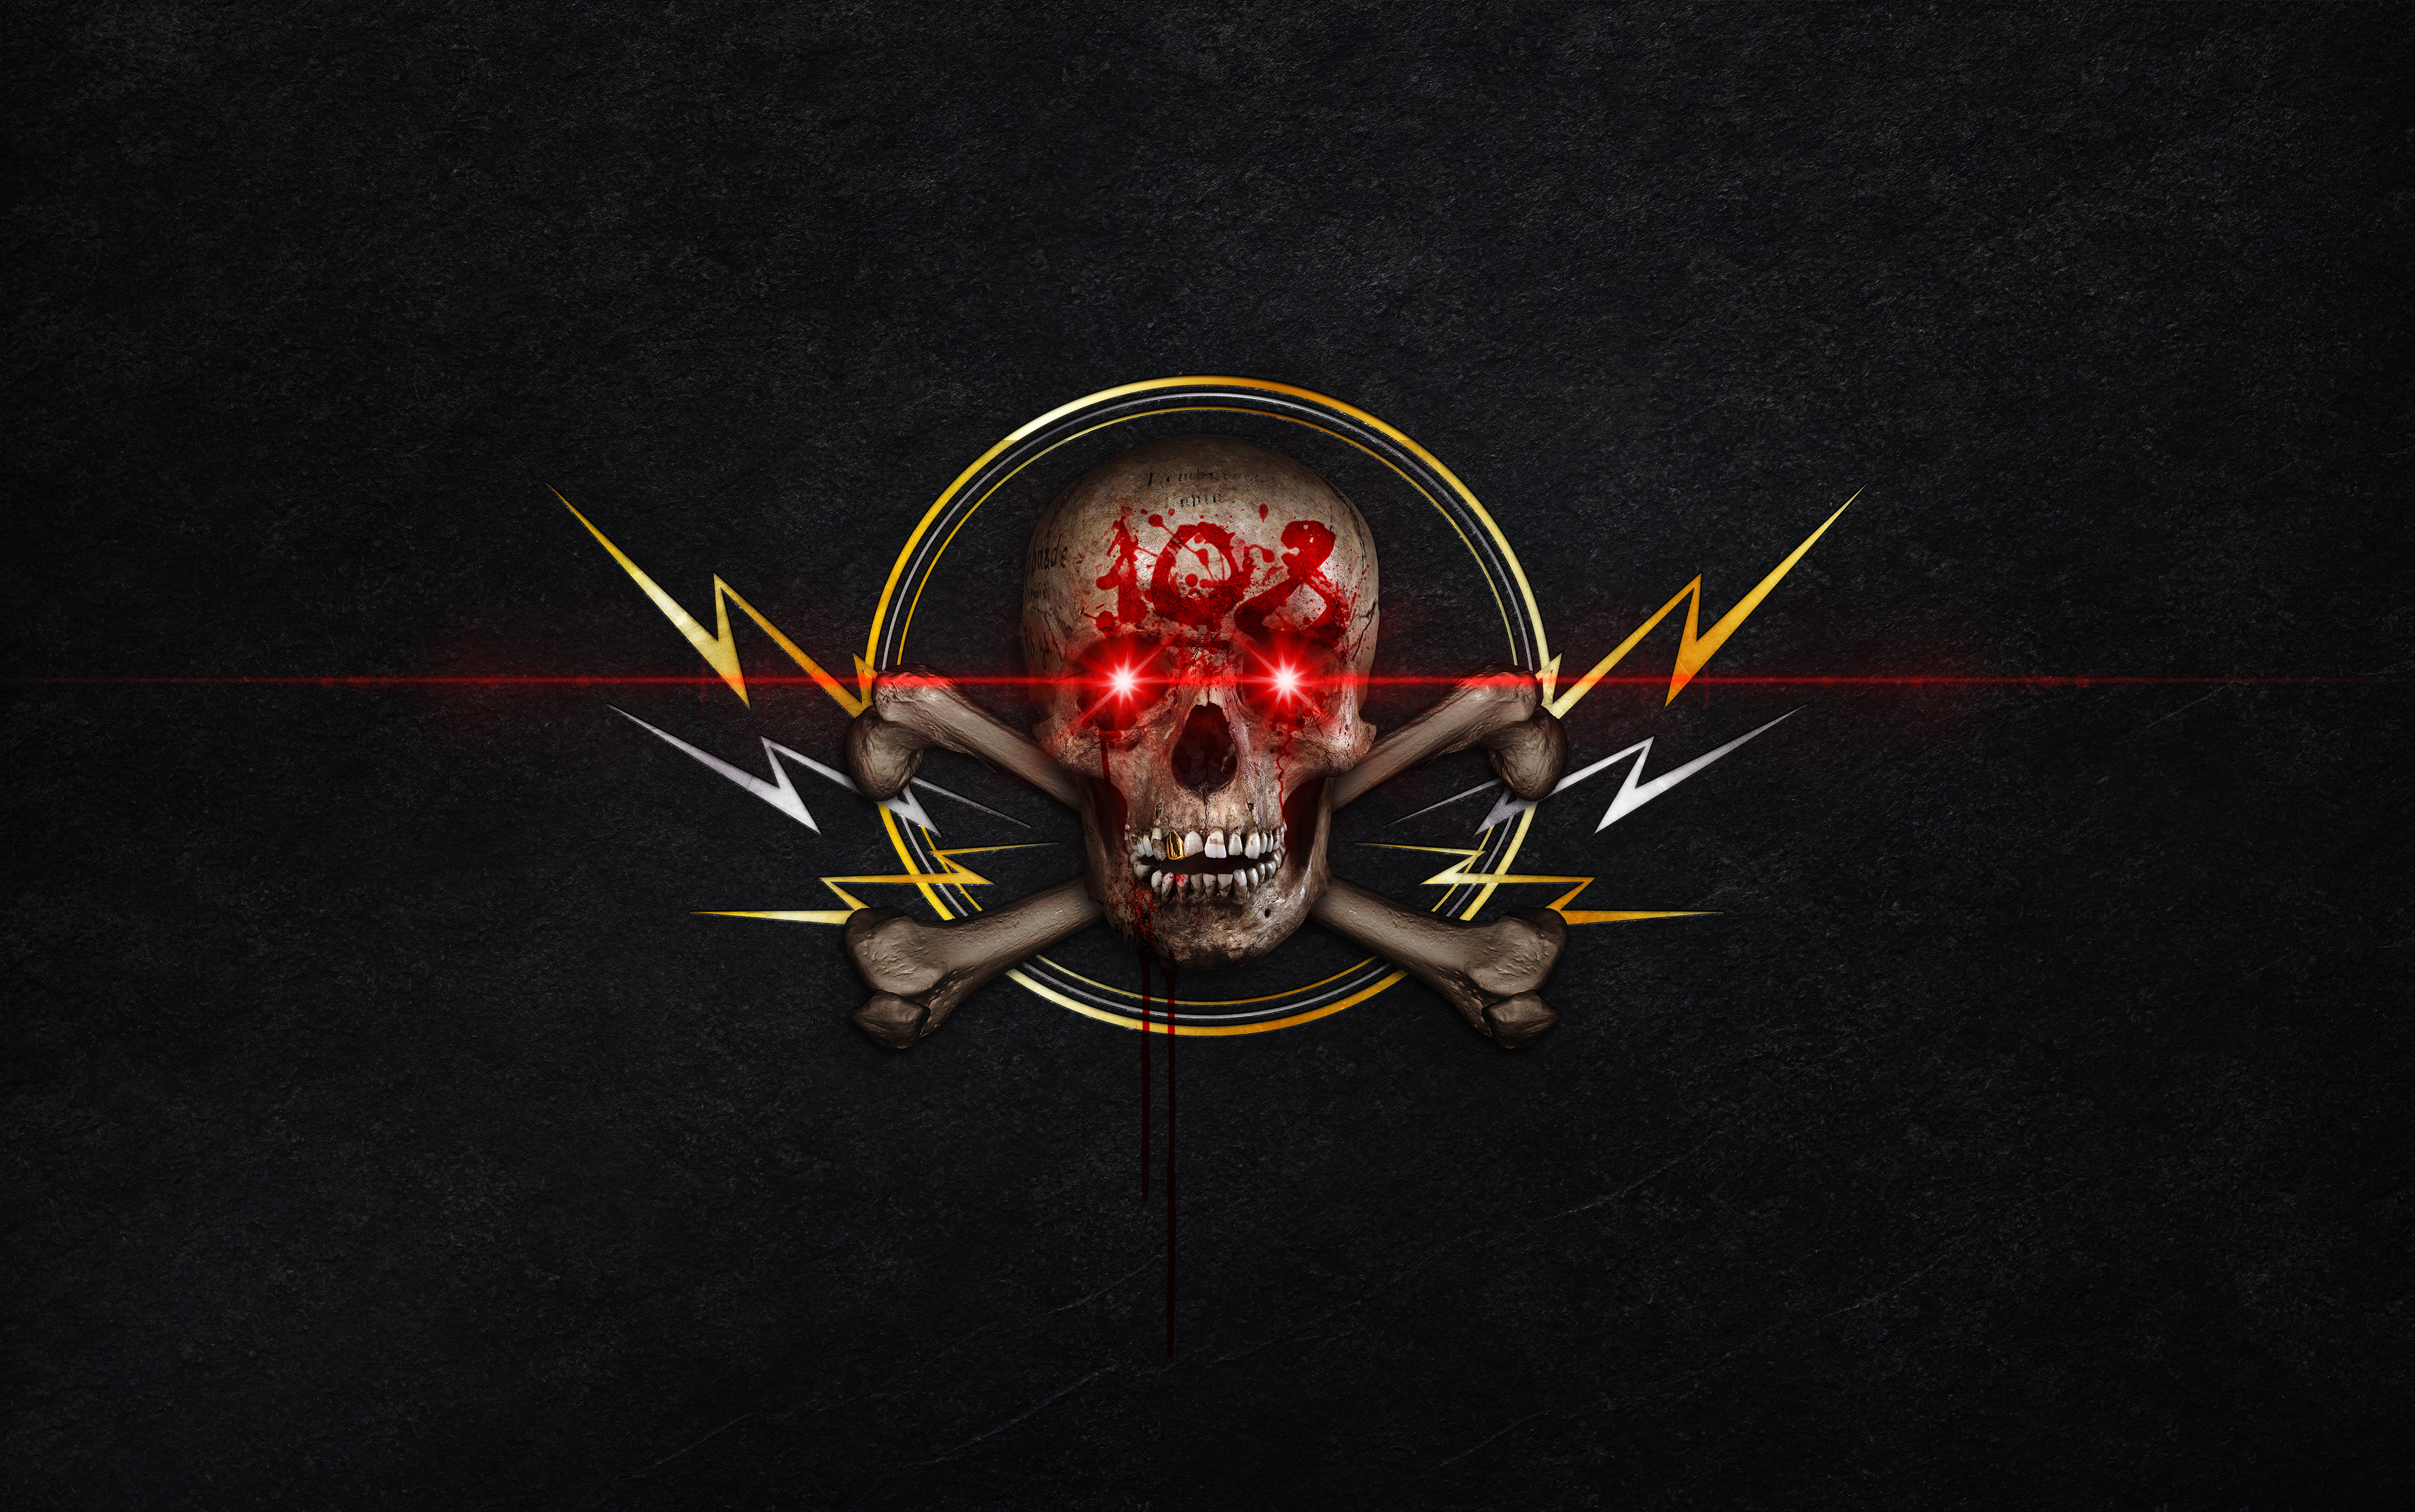 Skull And Bones 2018 Video Game 4k Hd Desktop Wallpaper: Skull And Bones 4k, HD Others, 4k Wallpapers, Images